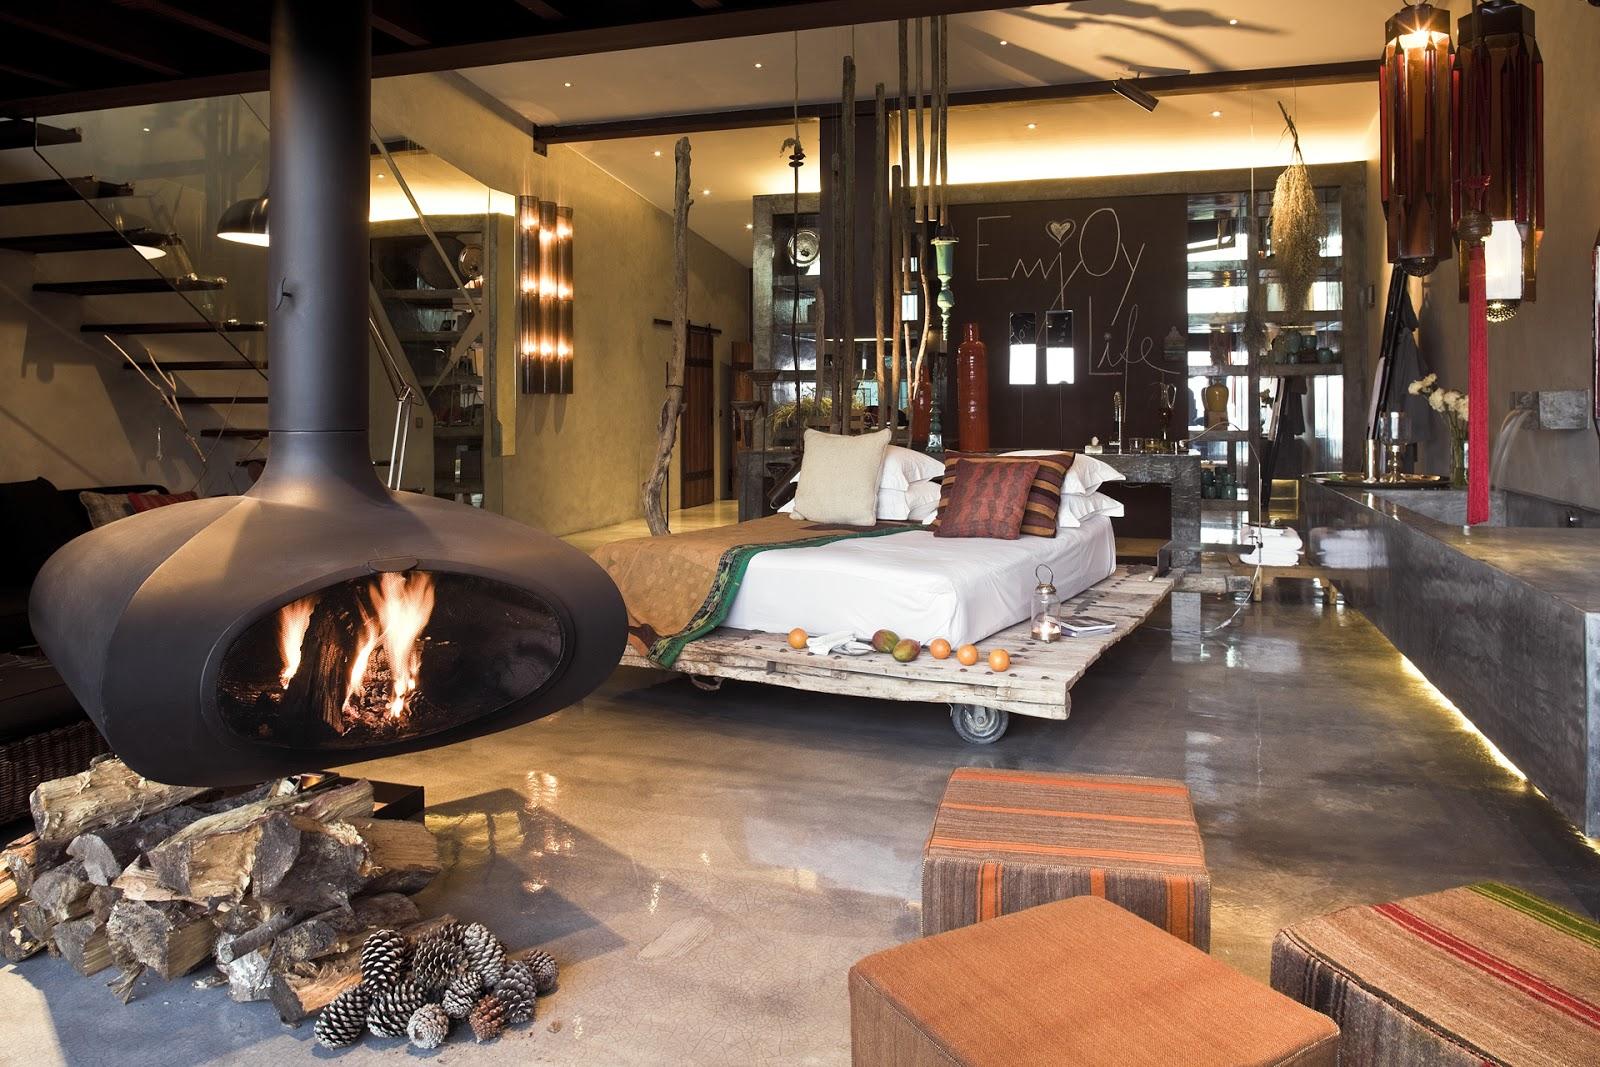 eco+style+holiday+luxury+areiasdoseixo+openspace+room++ethnicchic+cocomorocco+chimney